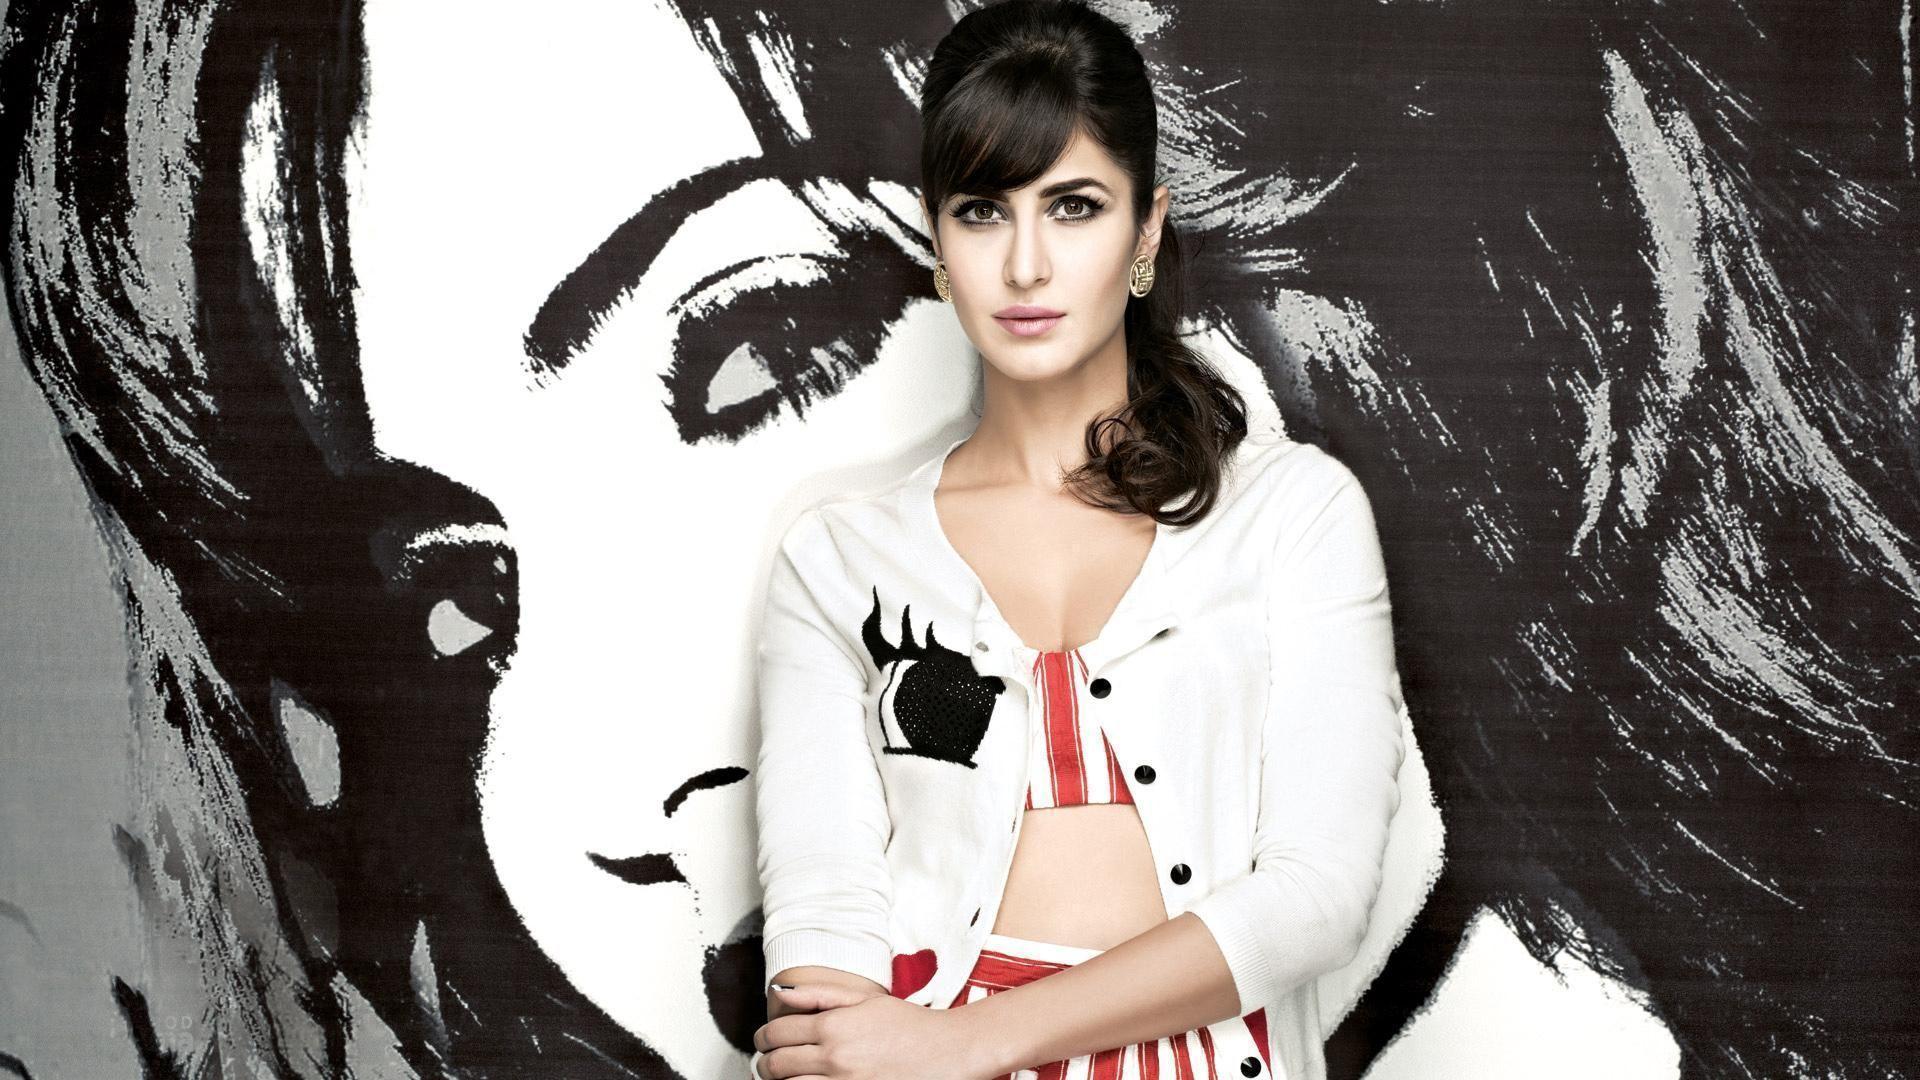 Download katrina kaif desktop wallpaer - Katrina Kaif Wallpapers Hd Download